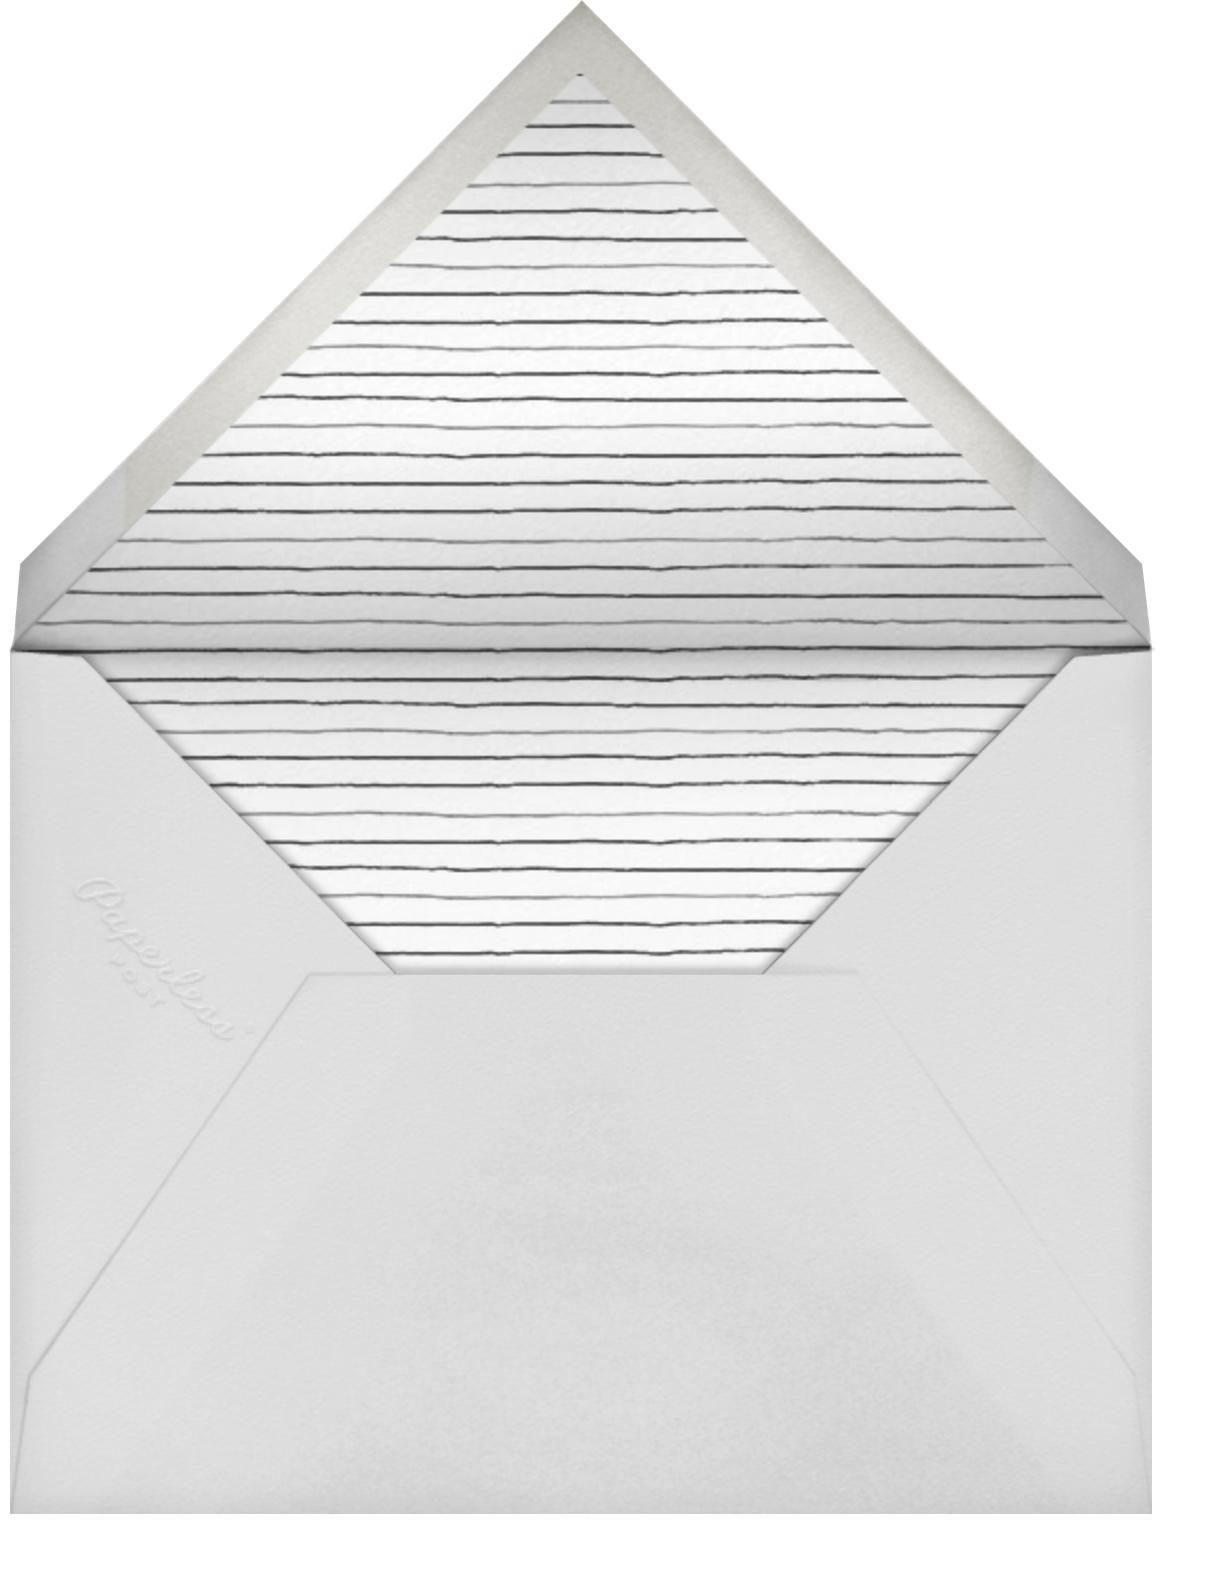 Duck Pin - Bondi - Paper Source - Baby shower - envelope back